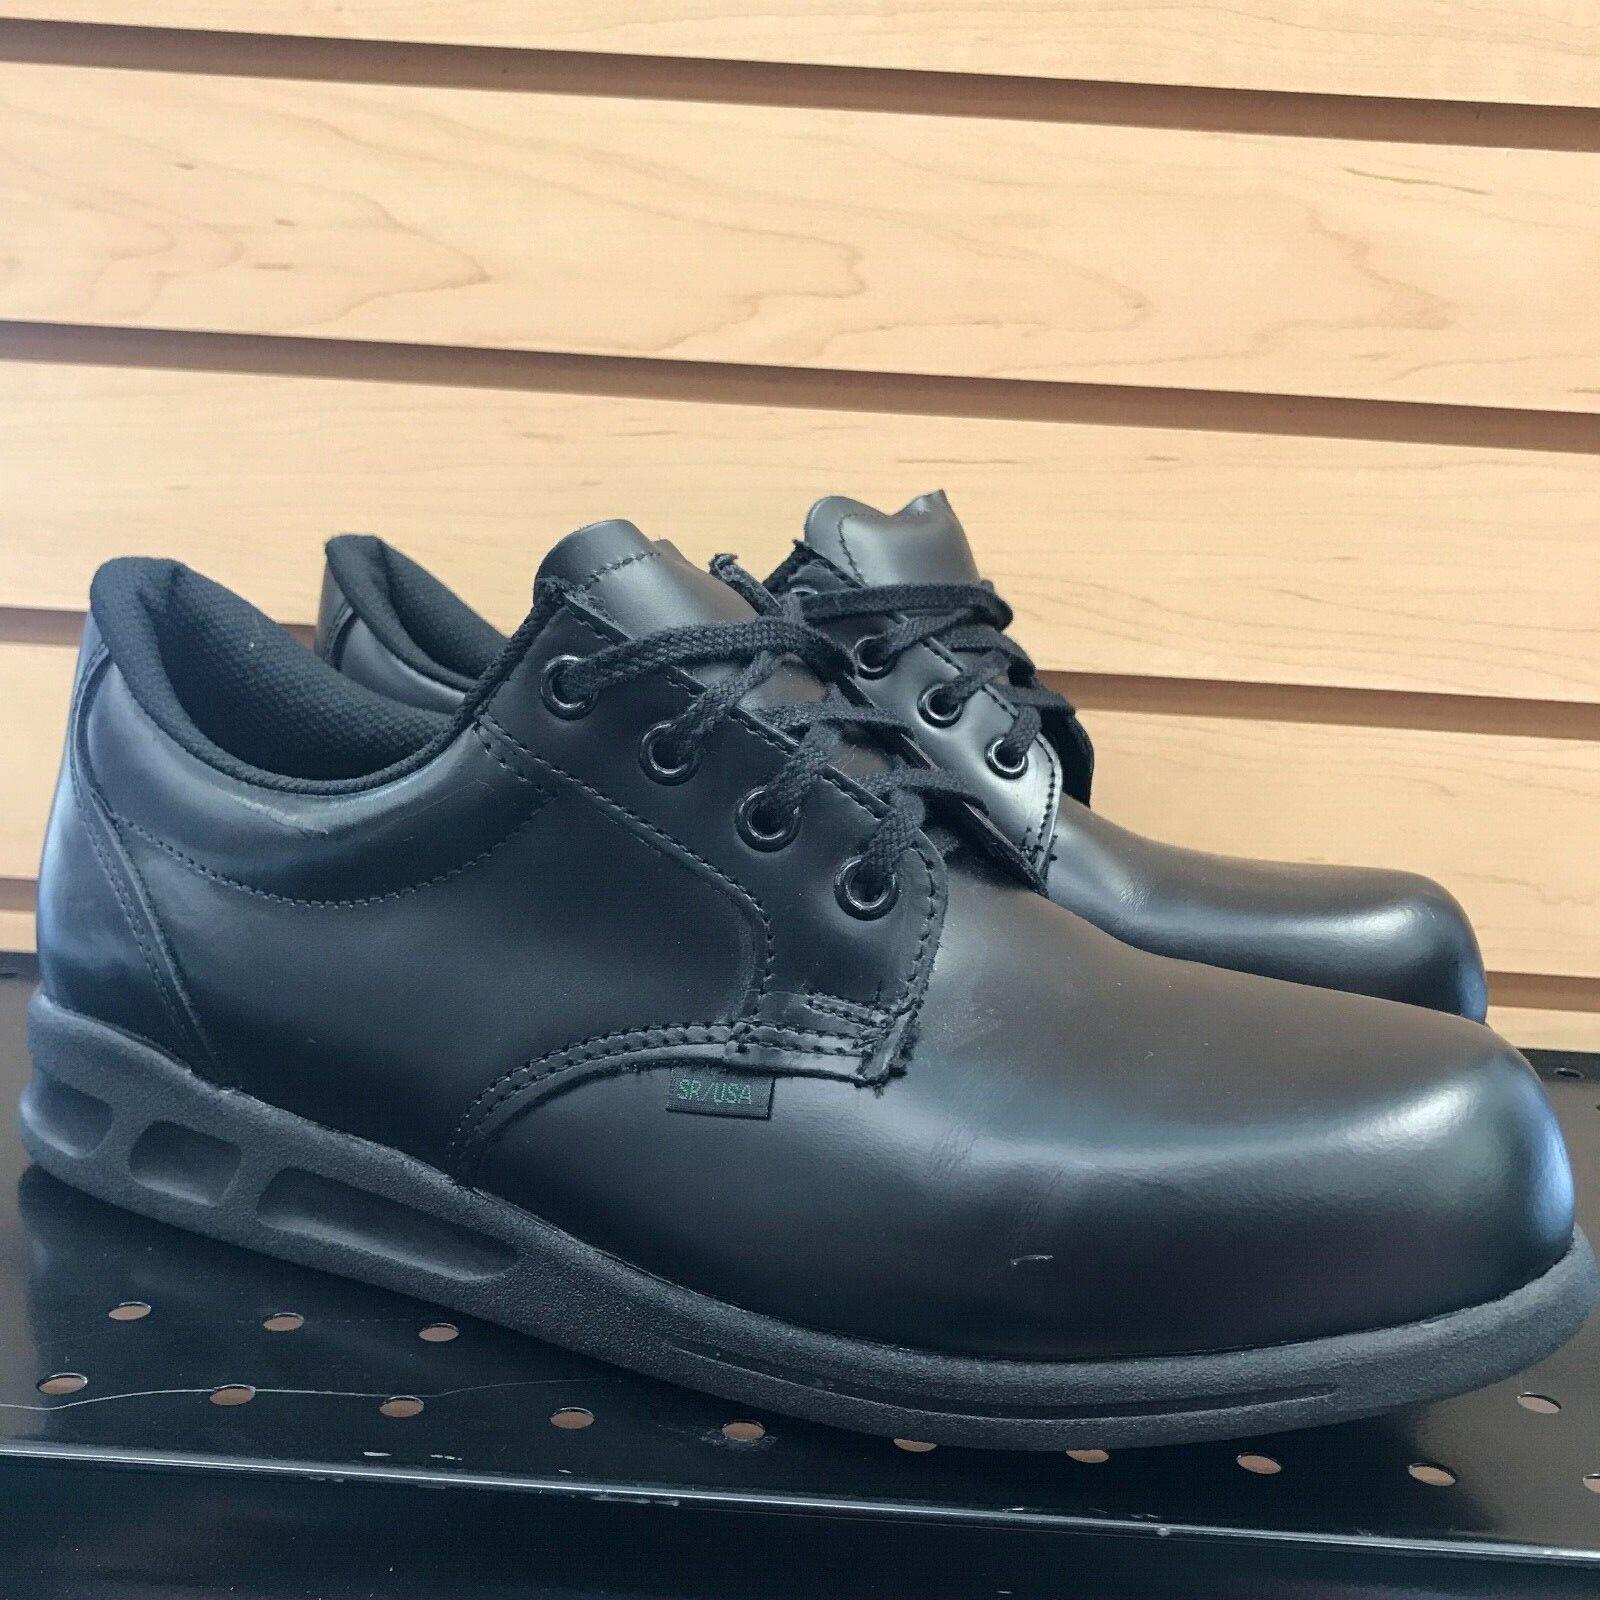 9 Thorogood Zapatos 834-6347 hecho en M EE. UU. Postal Oxford Athletic DEADSTOCK Vintage